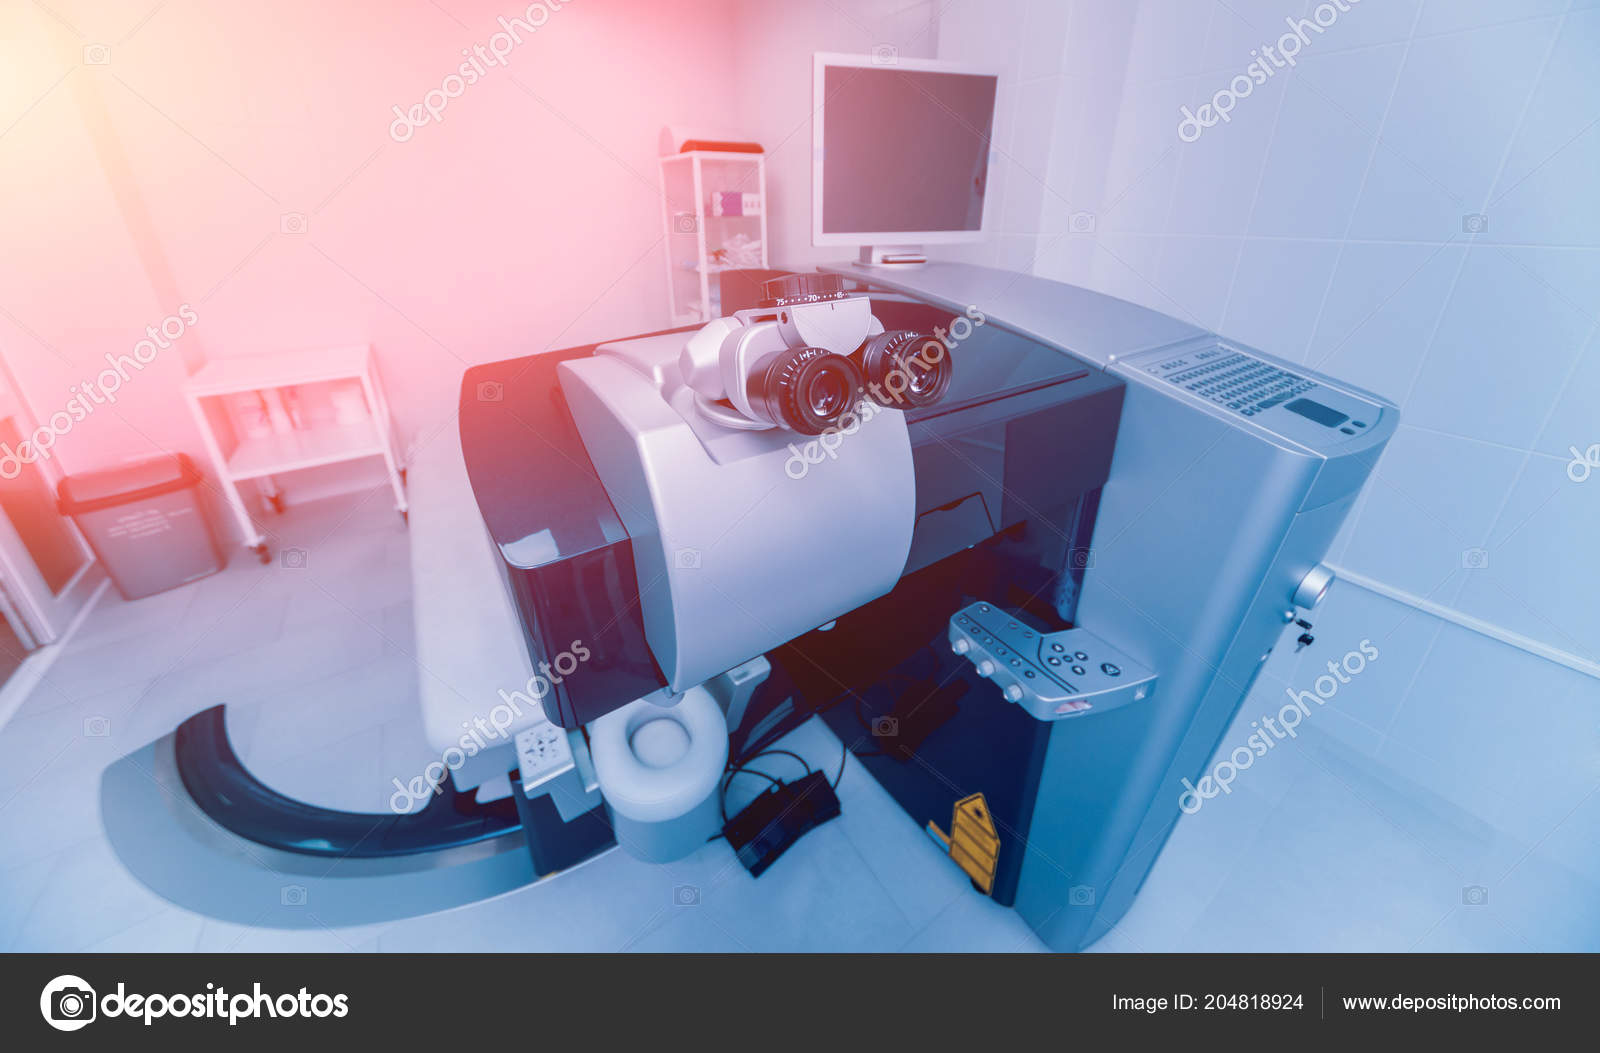 Sistema Laser Oftalmologia Clínica Cirurgia Olhos Treatmnet Laser Para  Miopia — Fotografia de Stock 1bd64818a9